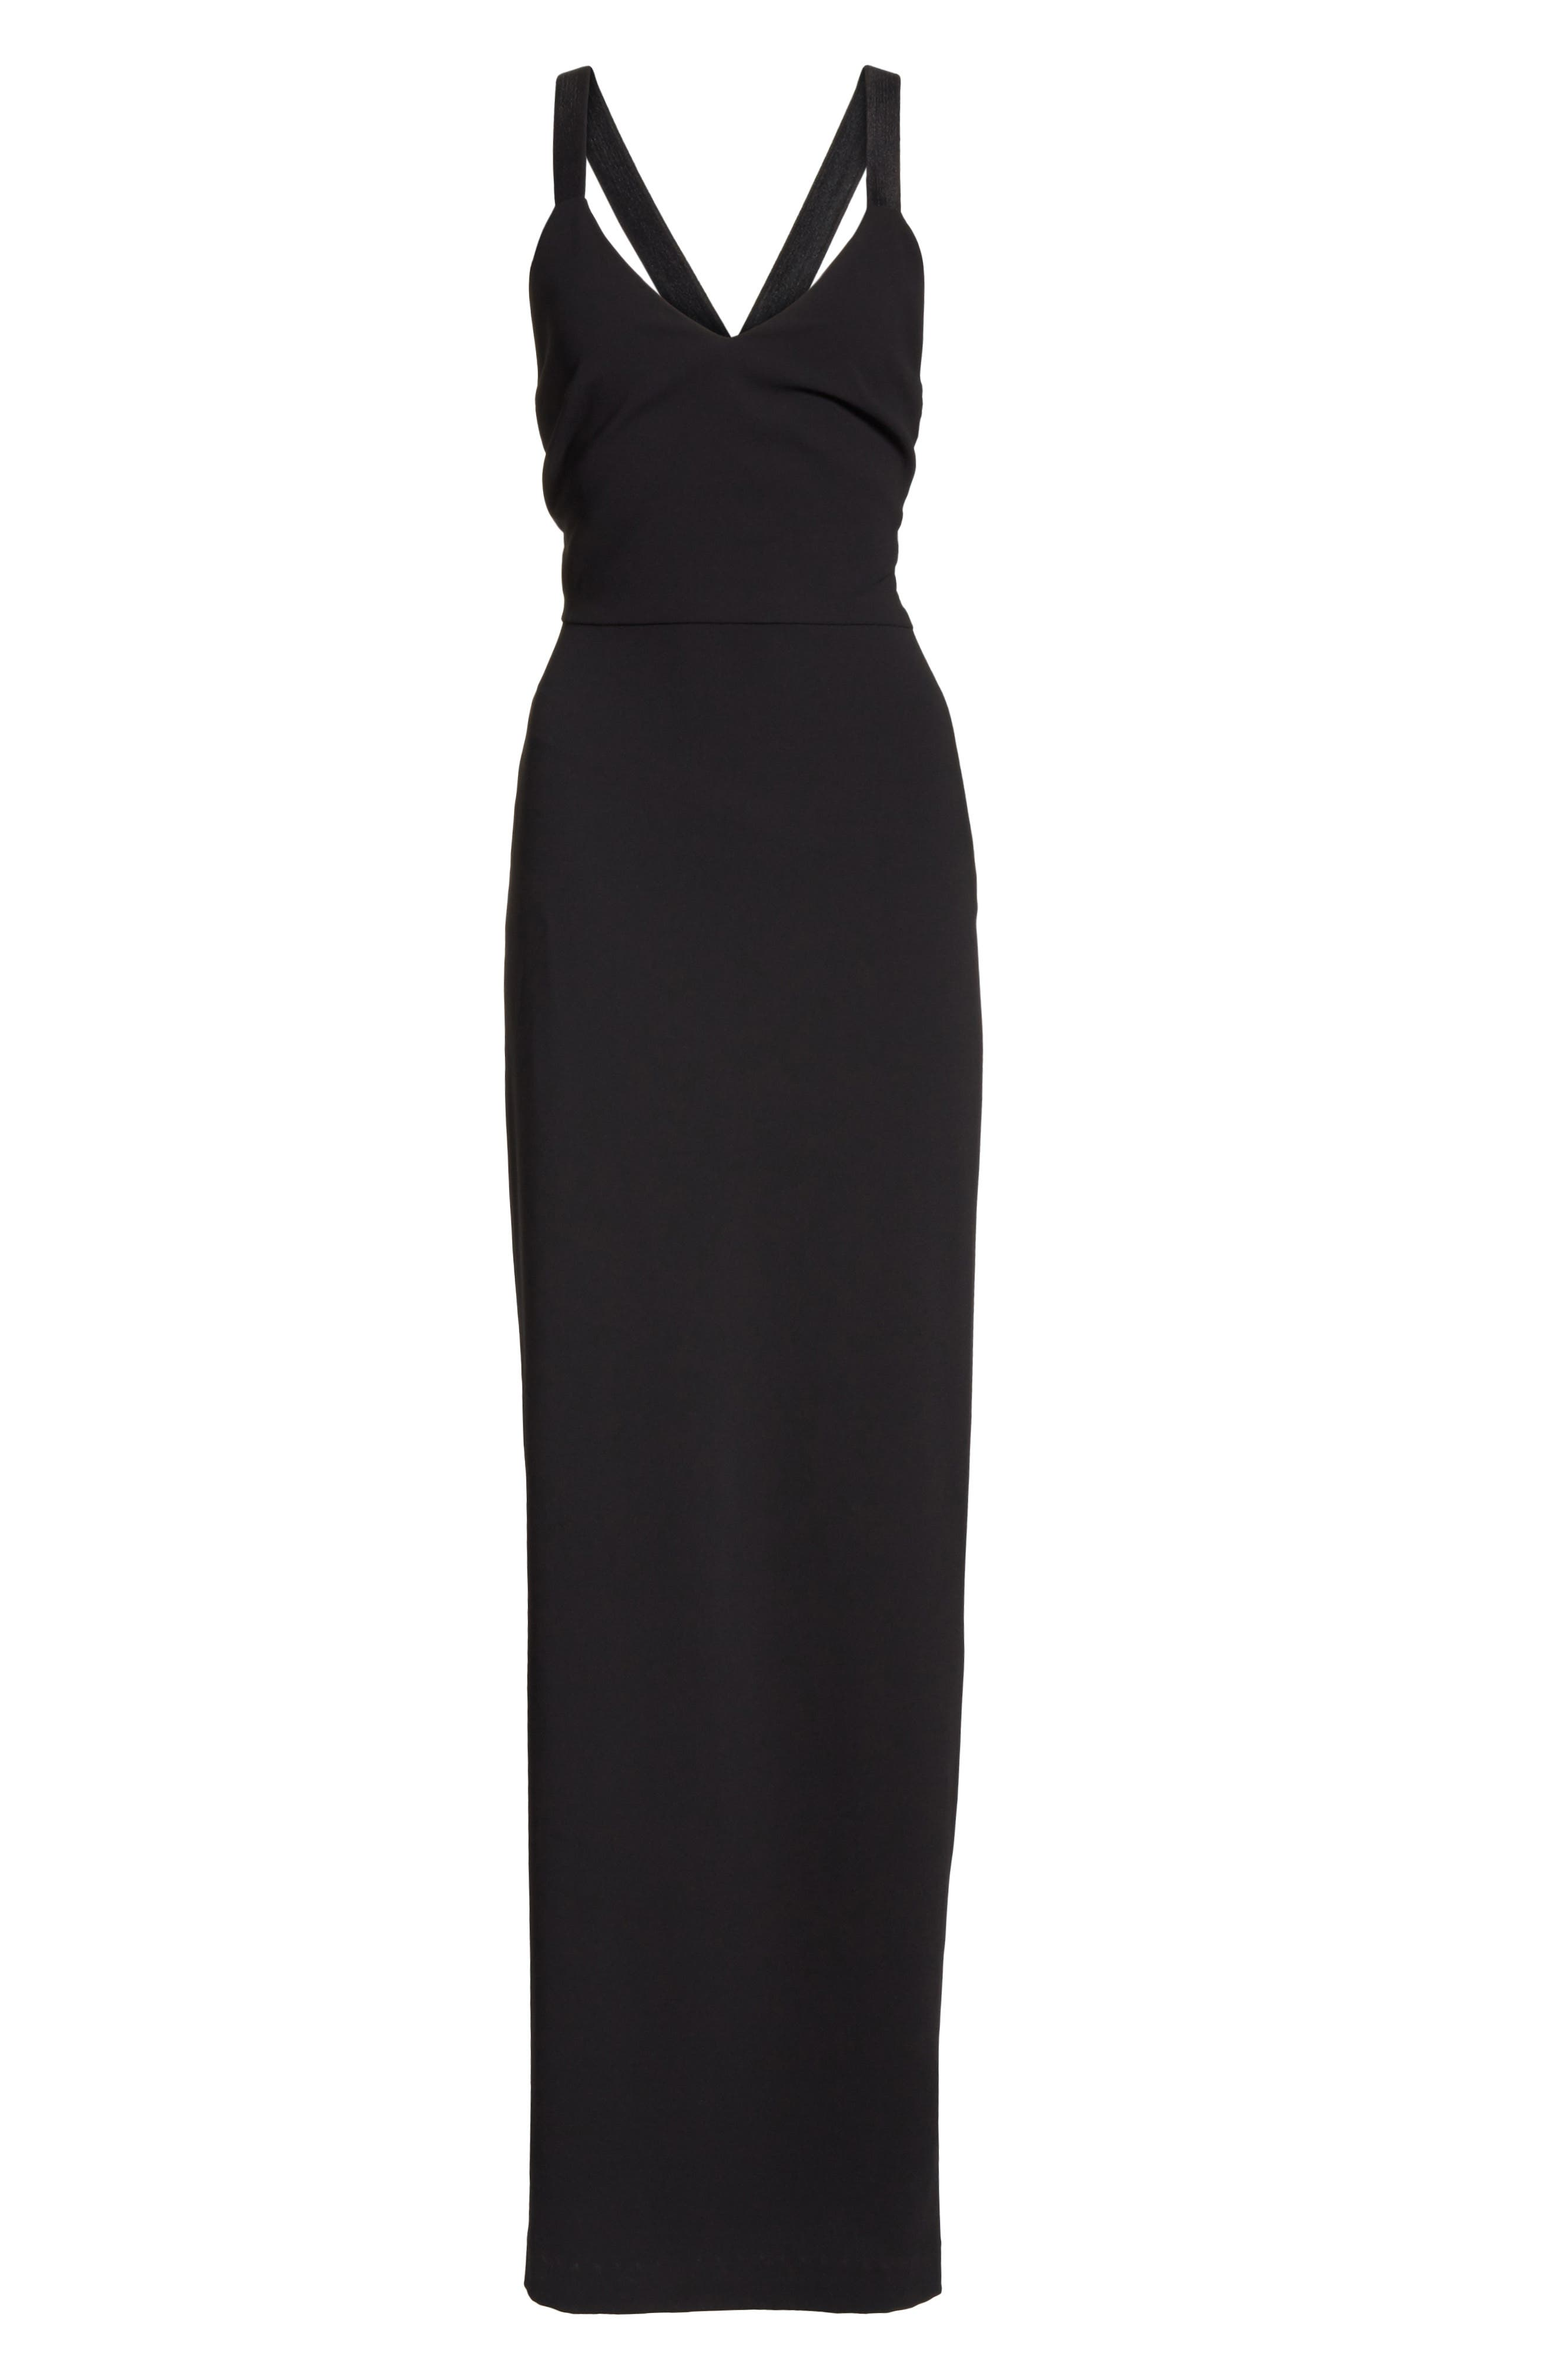 Brianna Strappy Back Maxi Dress,                             Alternate thumbnail 6, color,                             Black